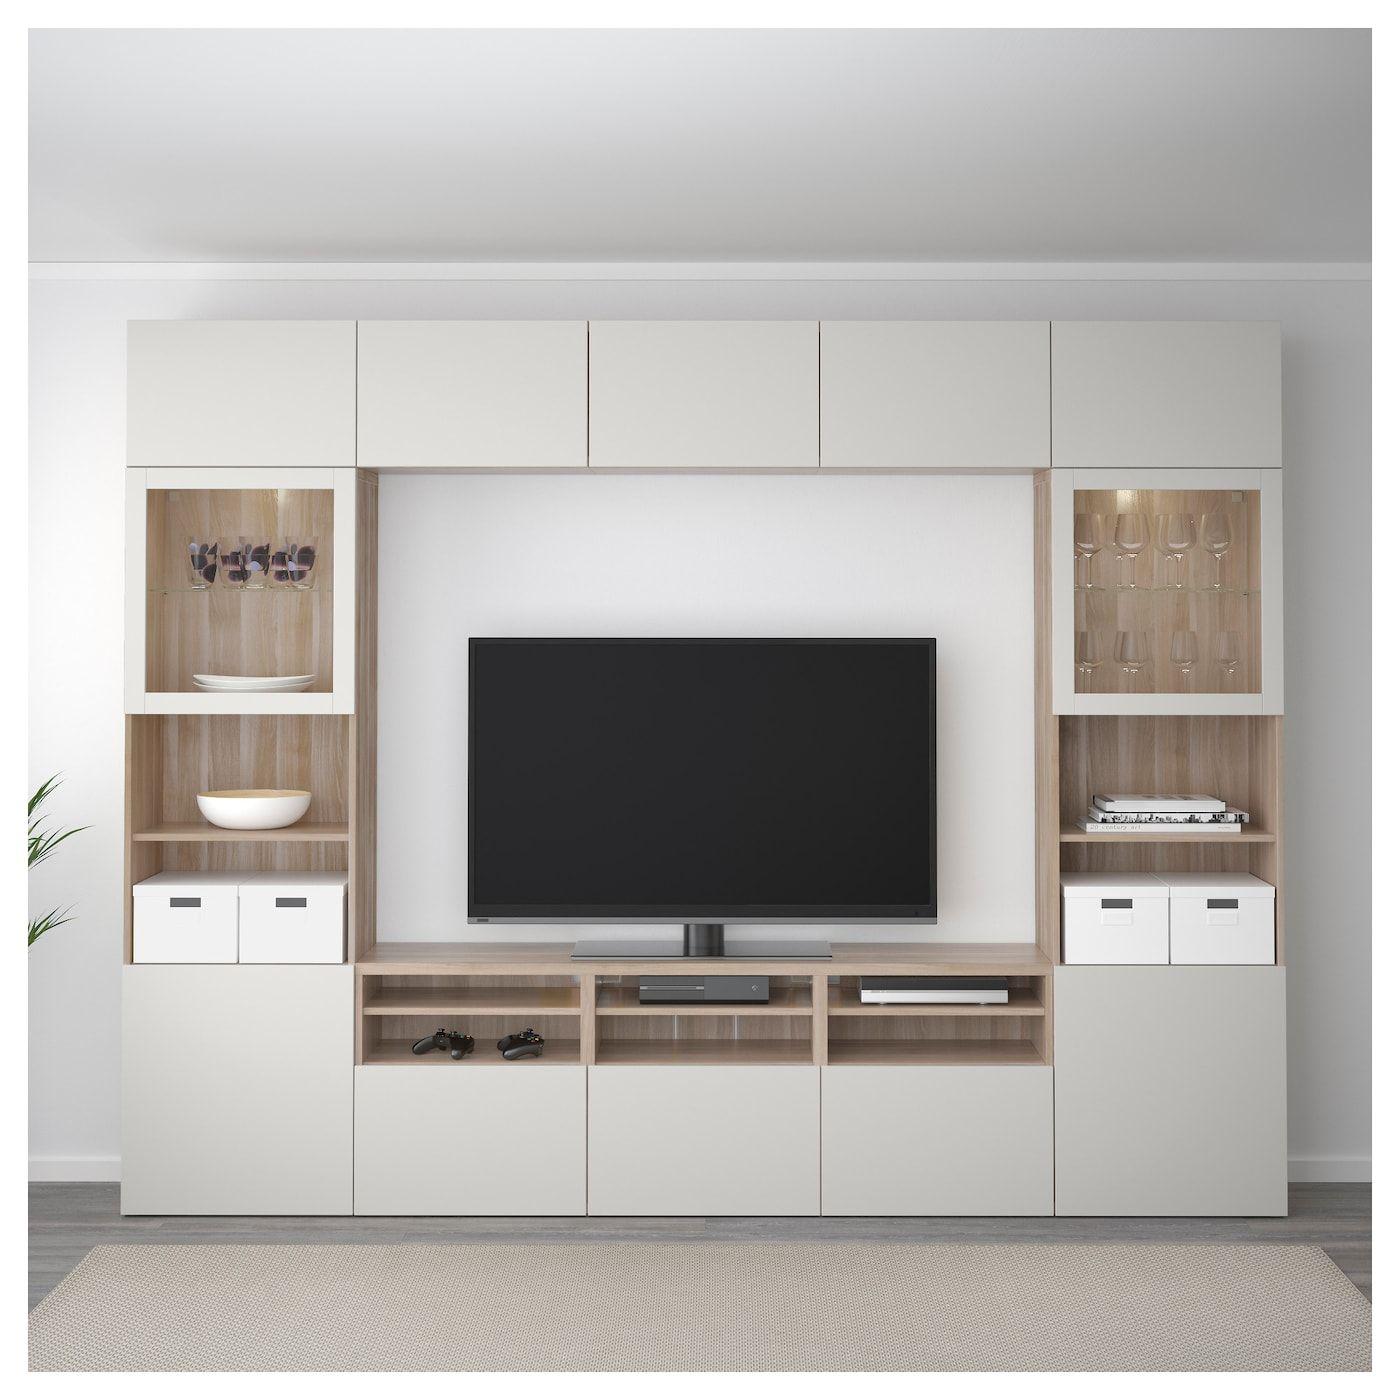 Ikea Us Furniture And Home Furnishings Living Room Tv Wall Tv Wall Design Living Room Tv